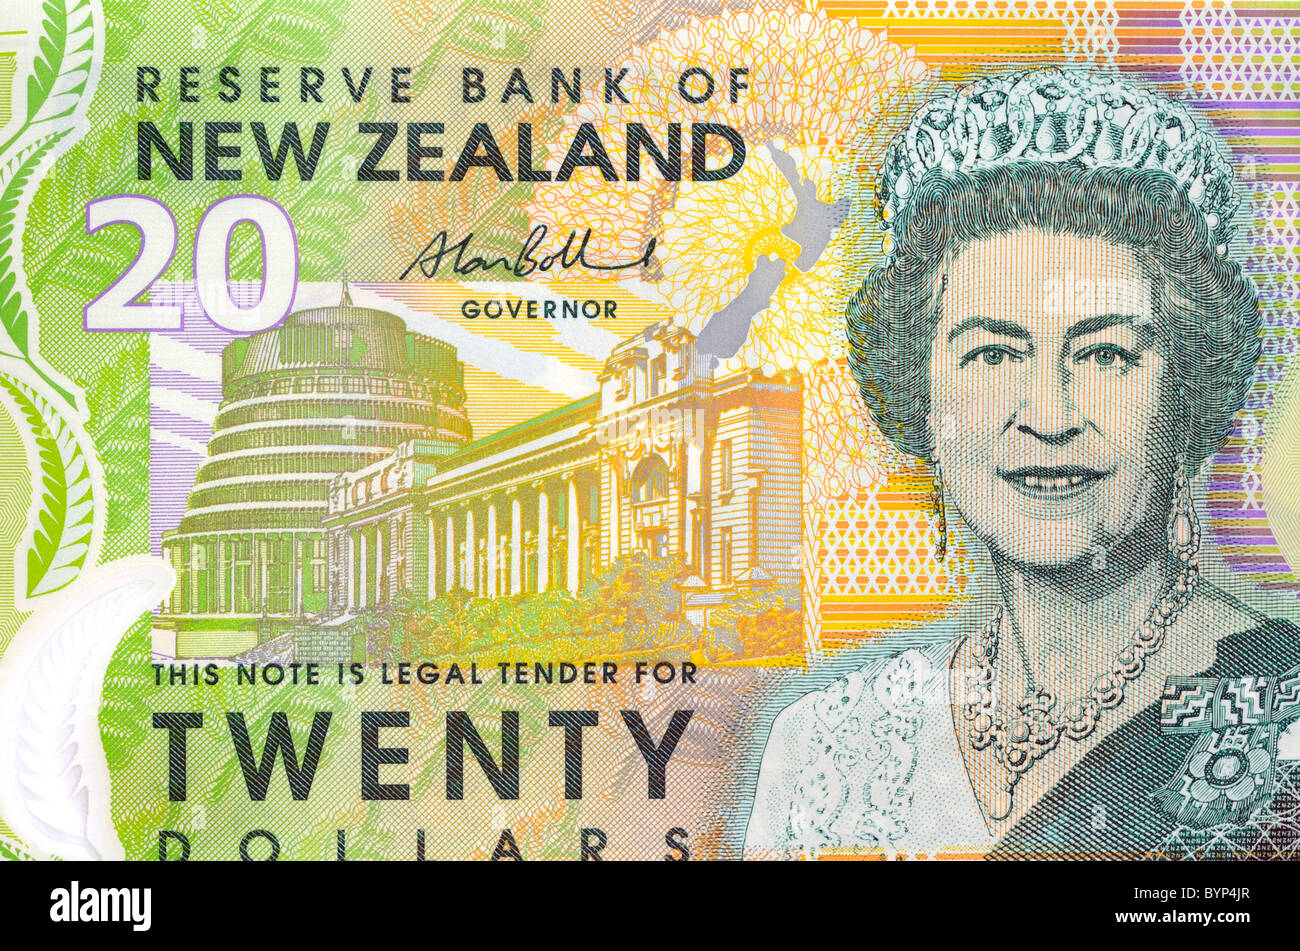 New Zealand Twenty 20 Dollar Note. - Stock Image